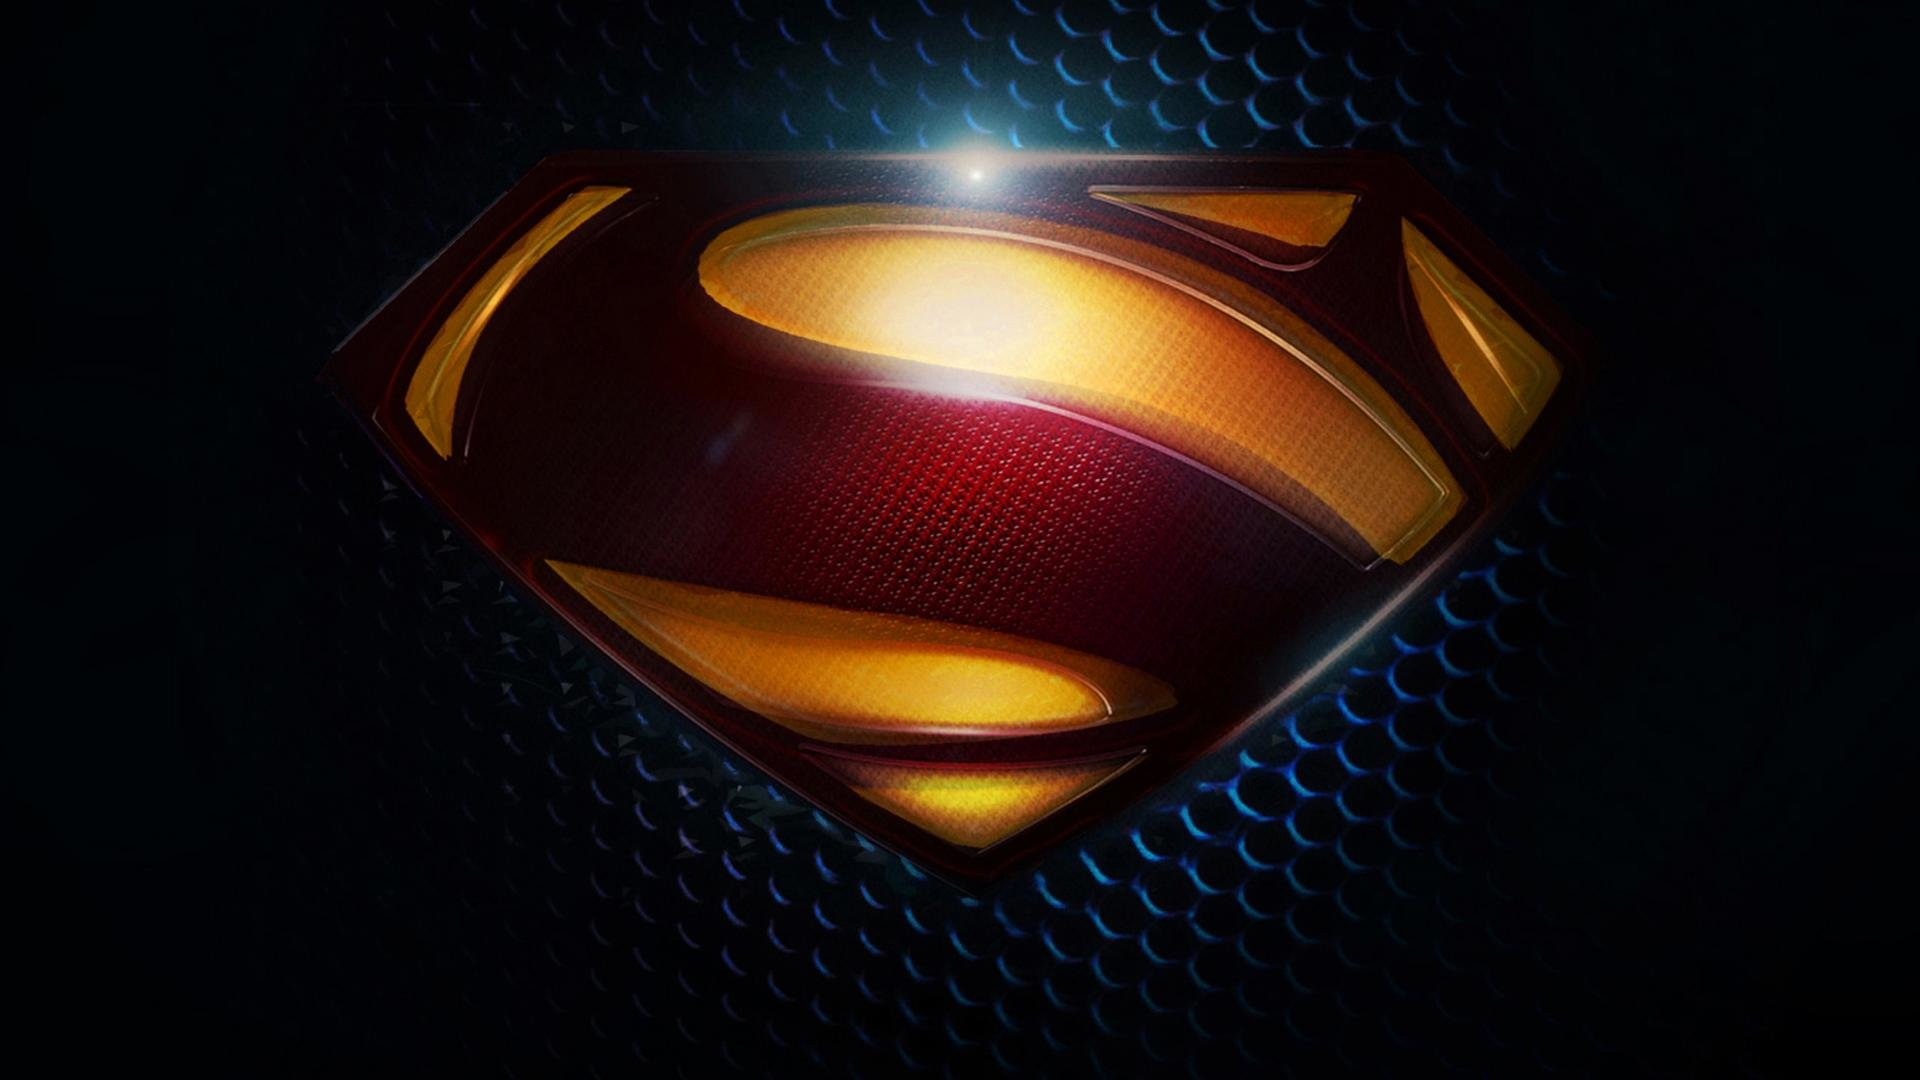 superman logo wallpapers 1920x1080 full hd 1080p desktop